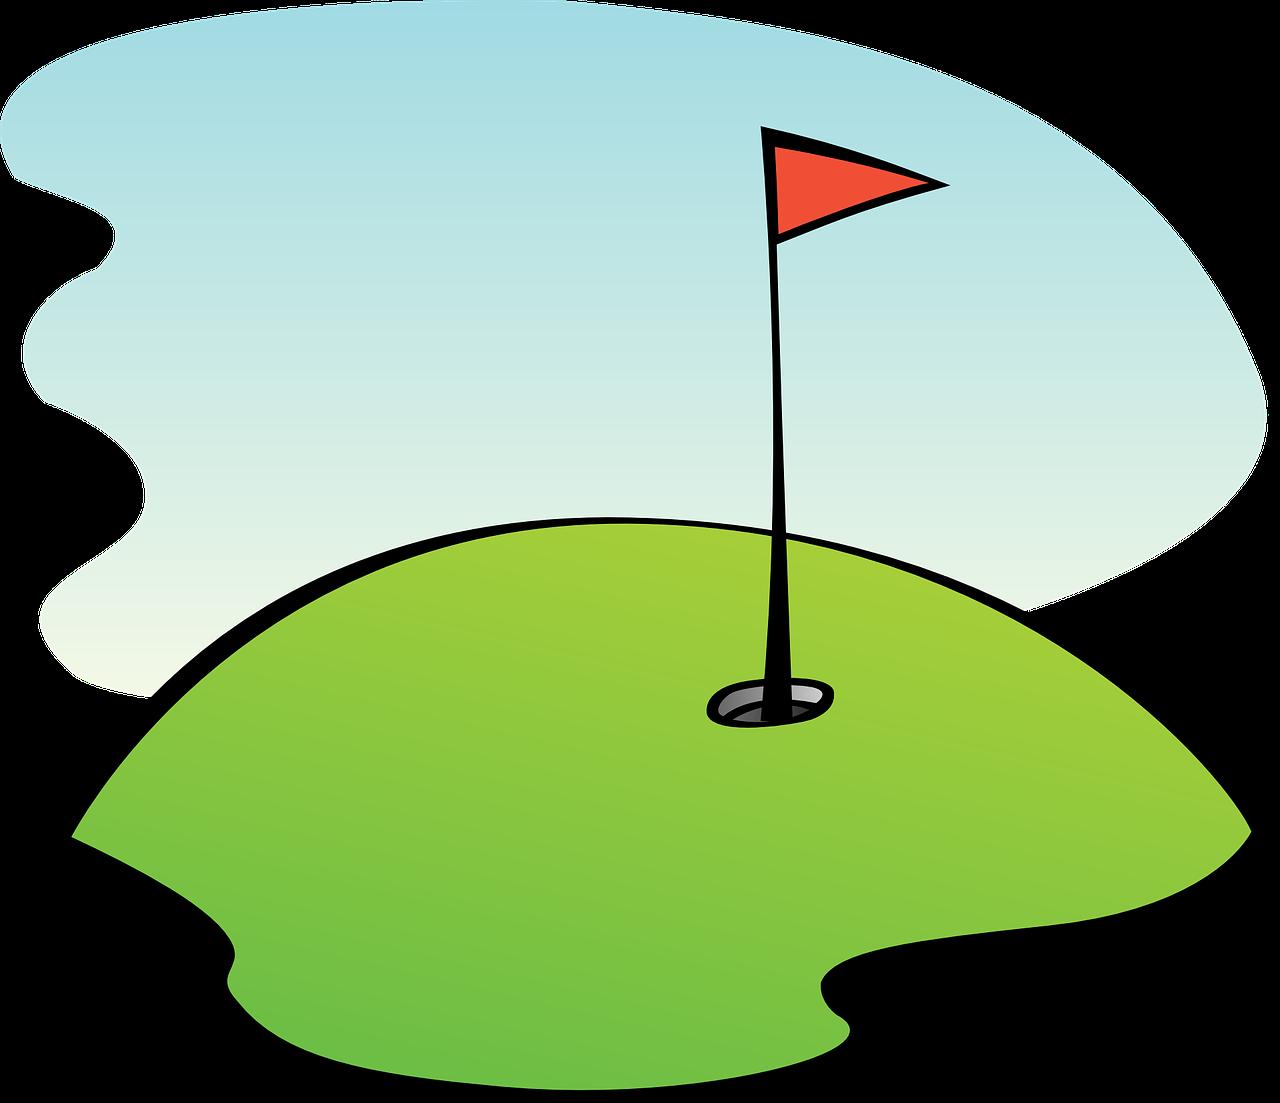 Club clipart gold club. Quality german shepherd golf